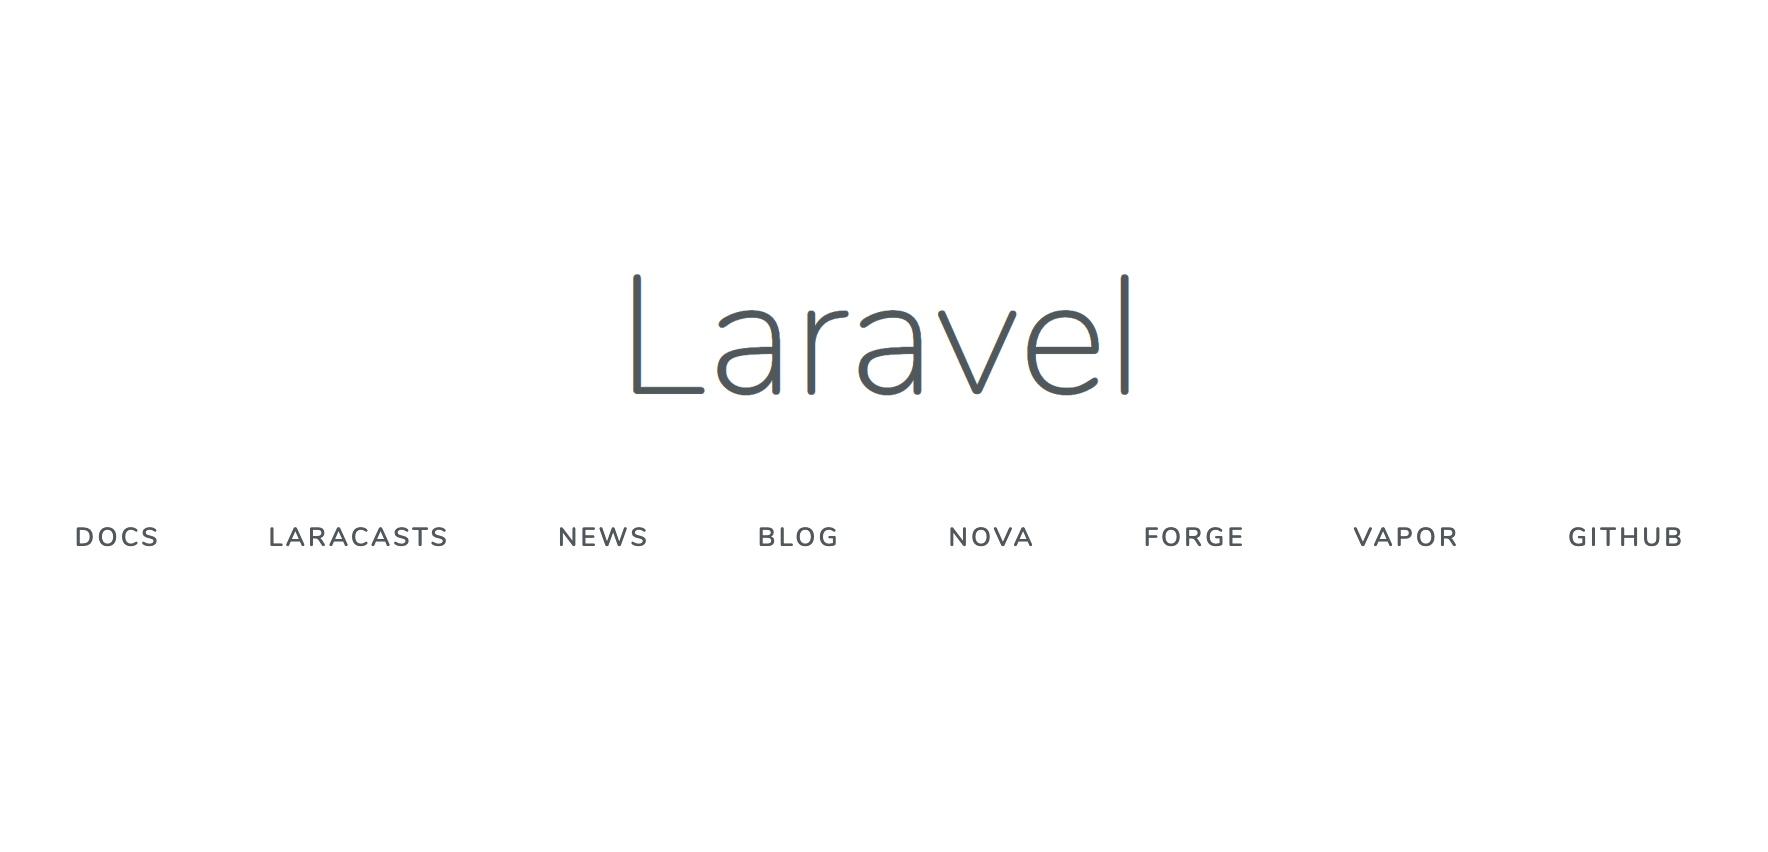 Laravel 7 欢迎页面